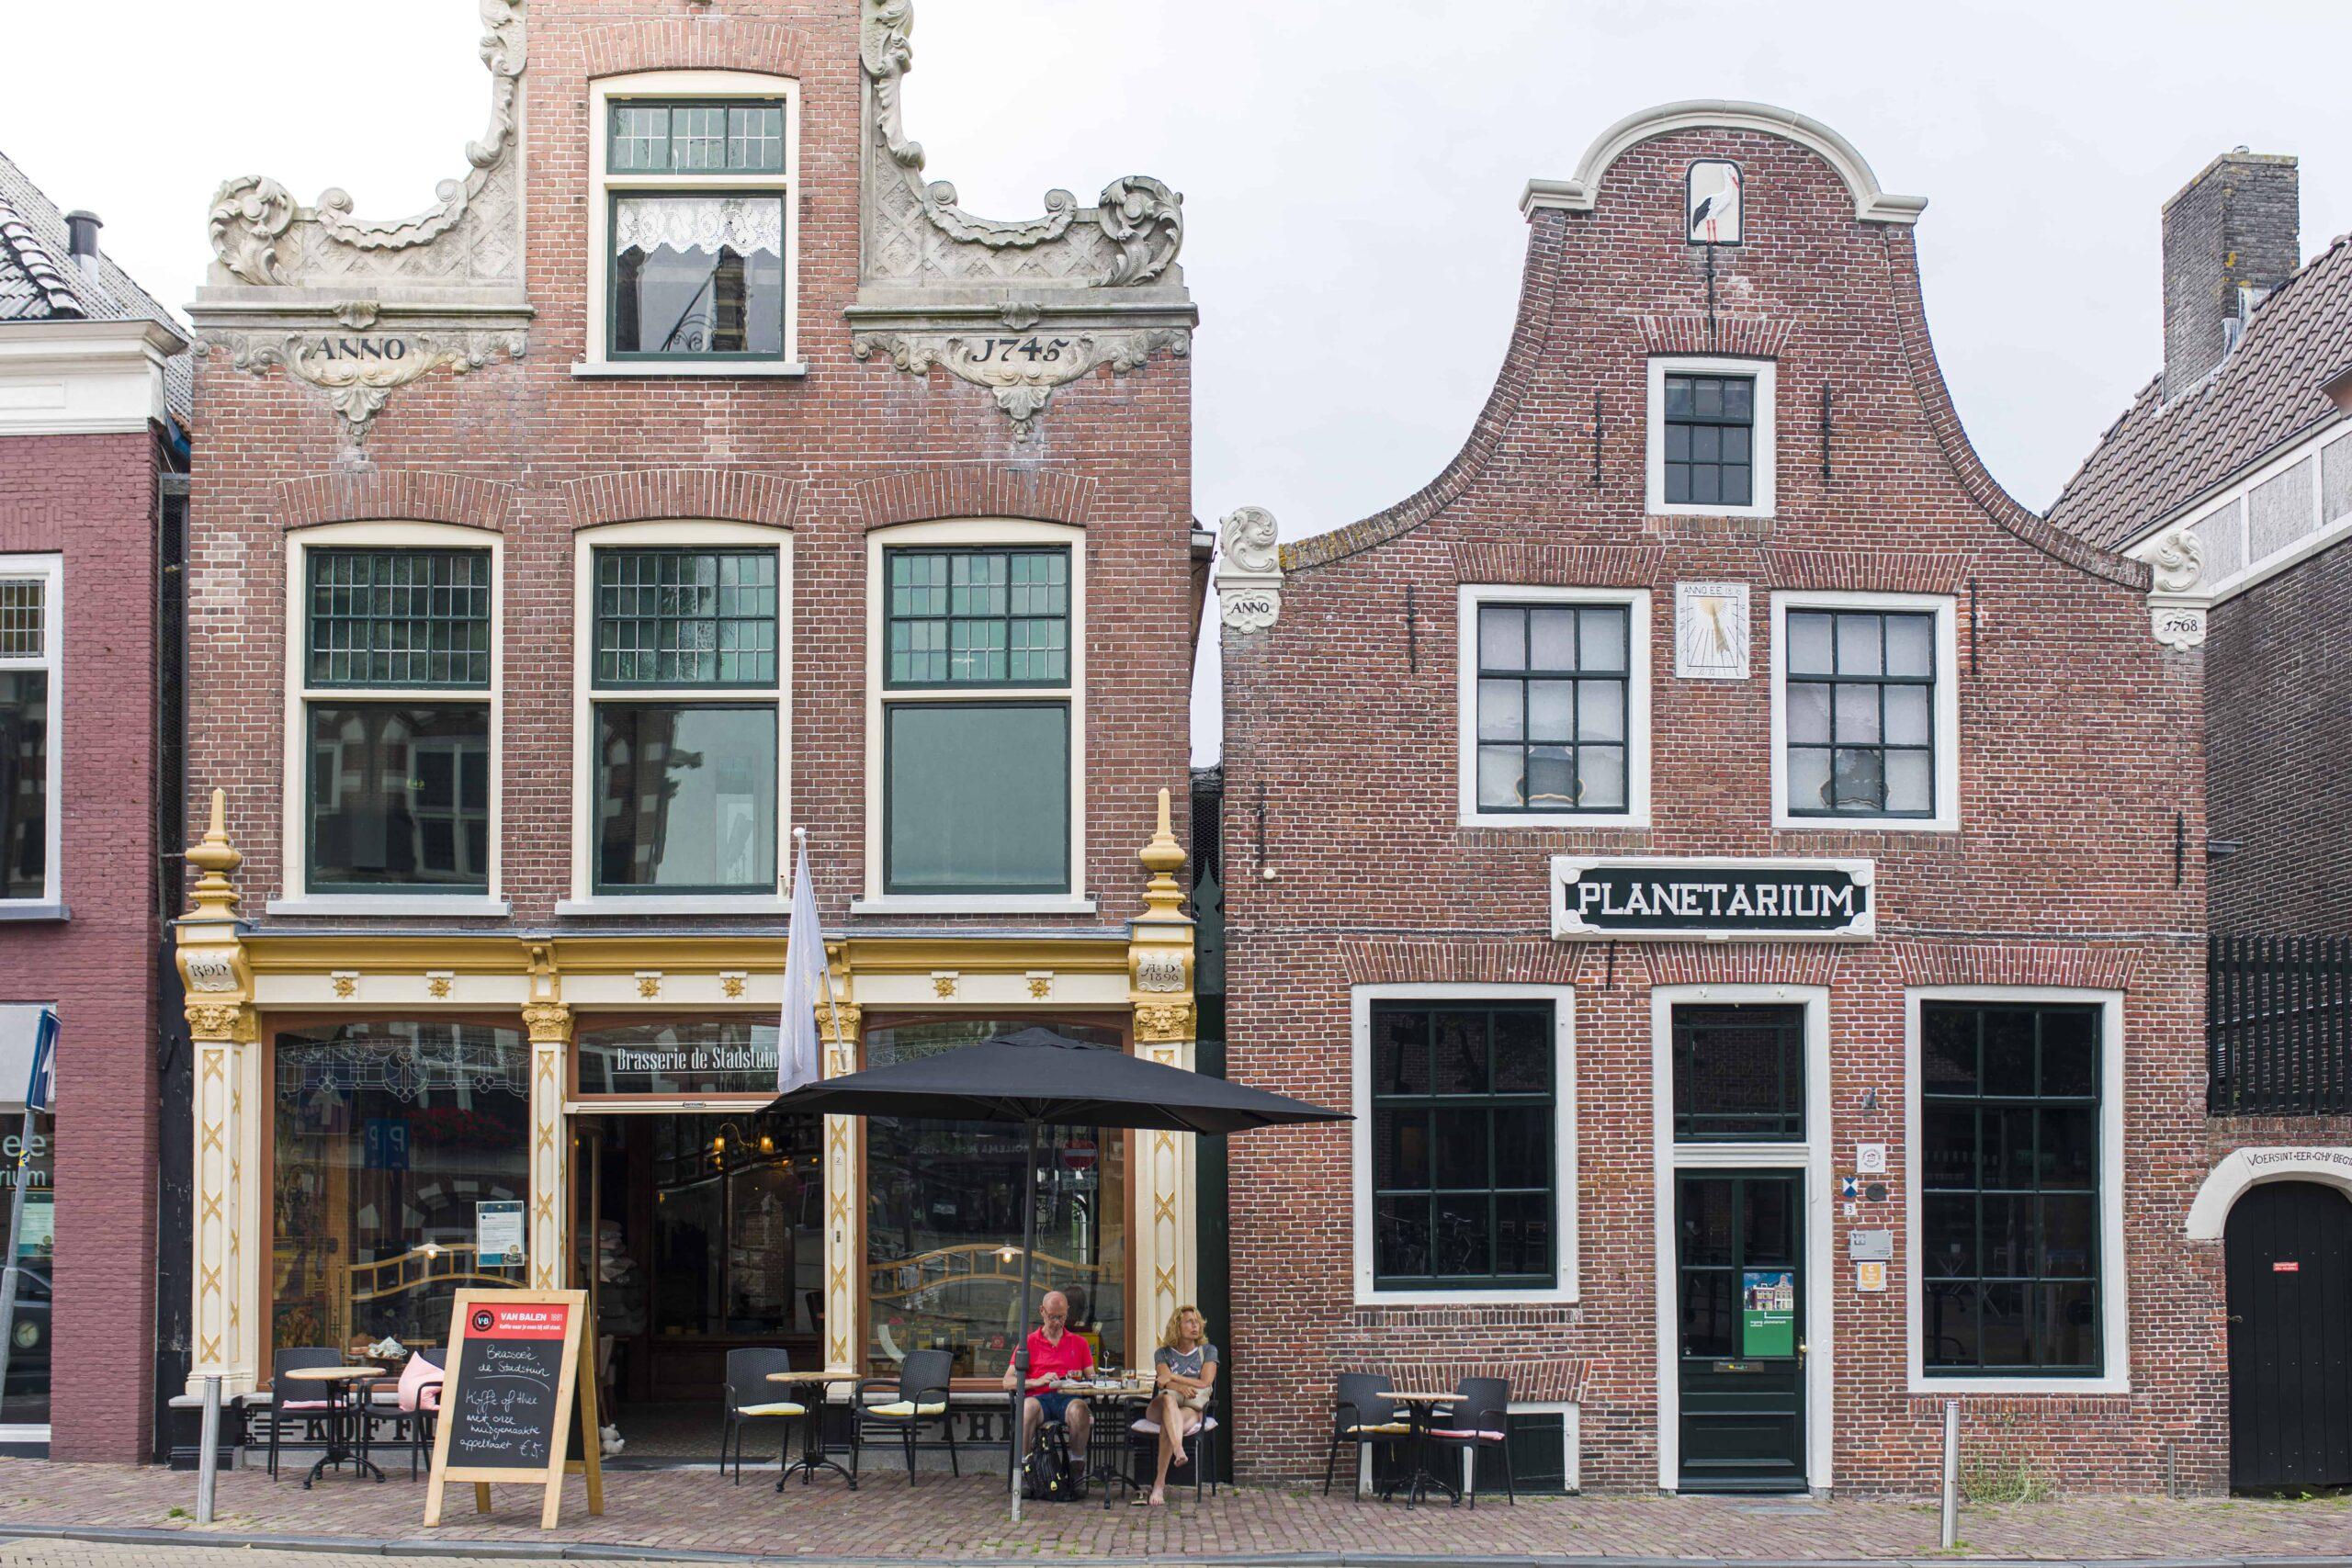 Camperelfstedentocht - Franeker